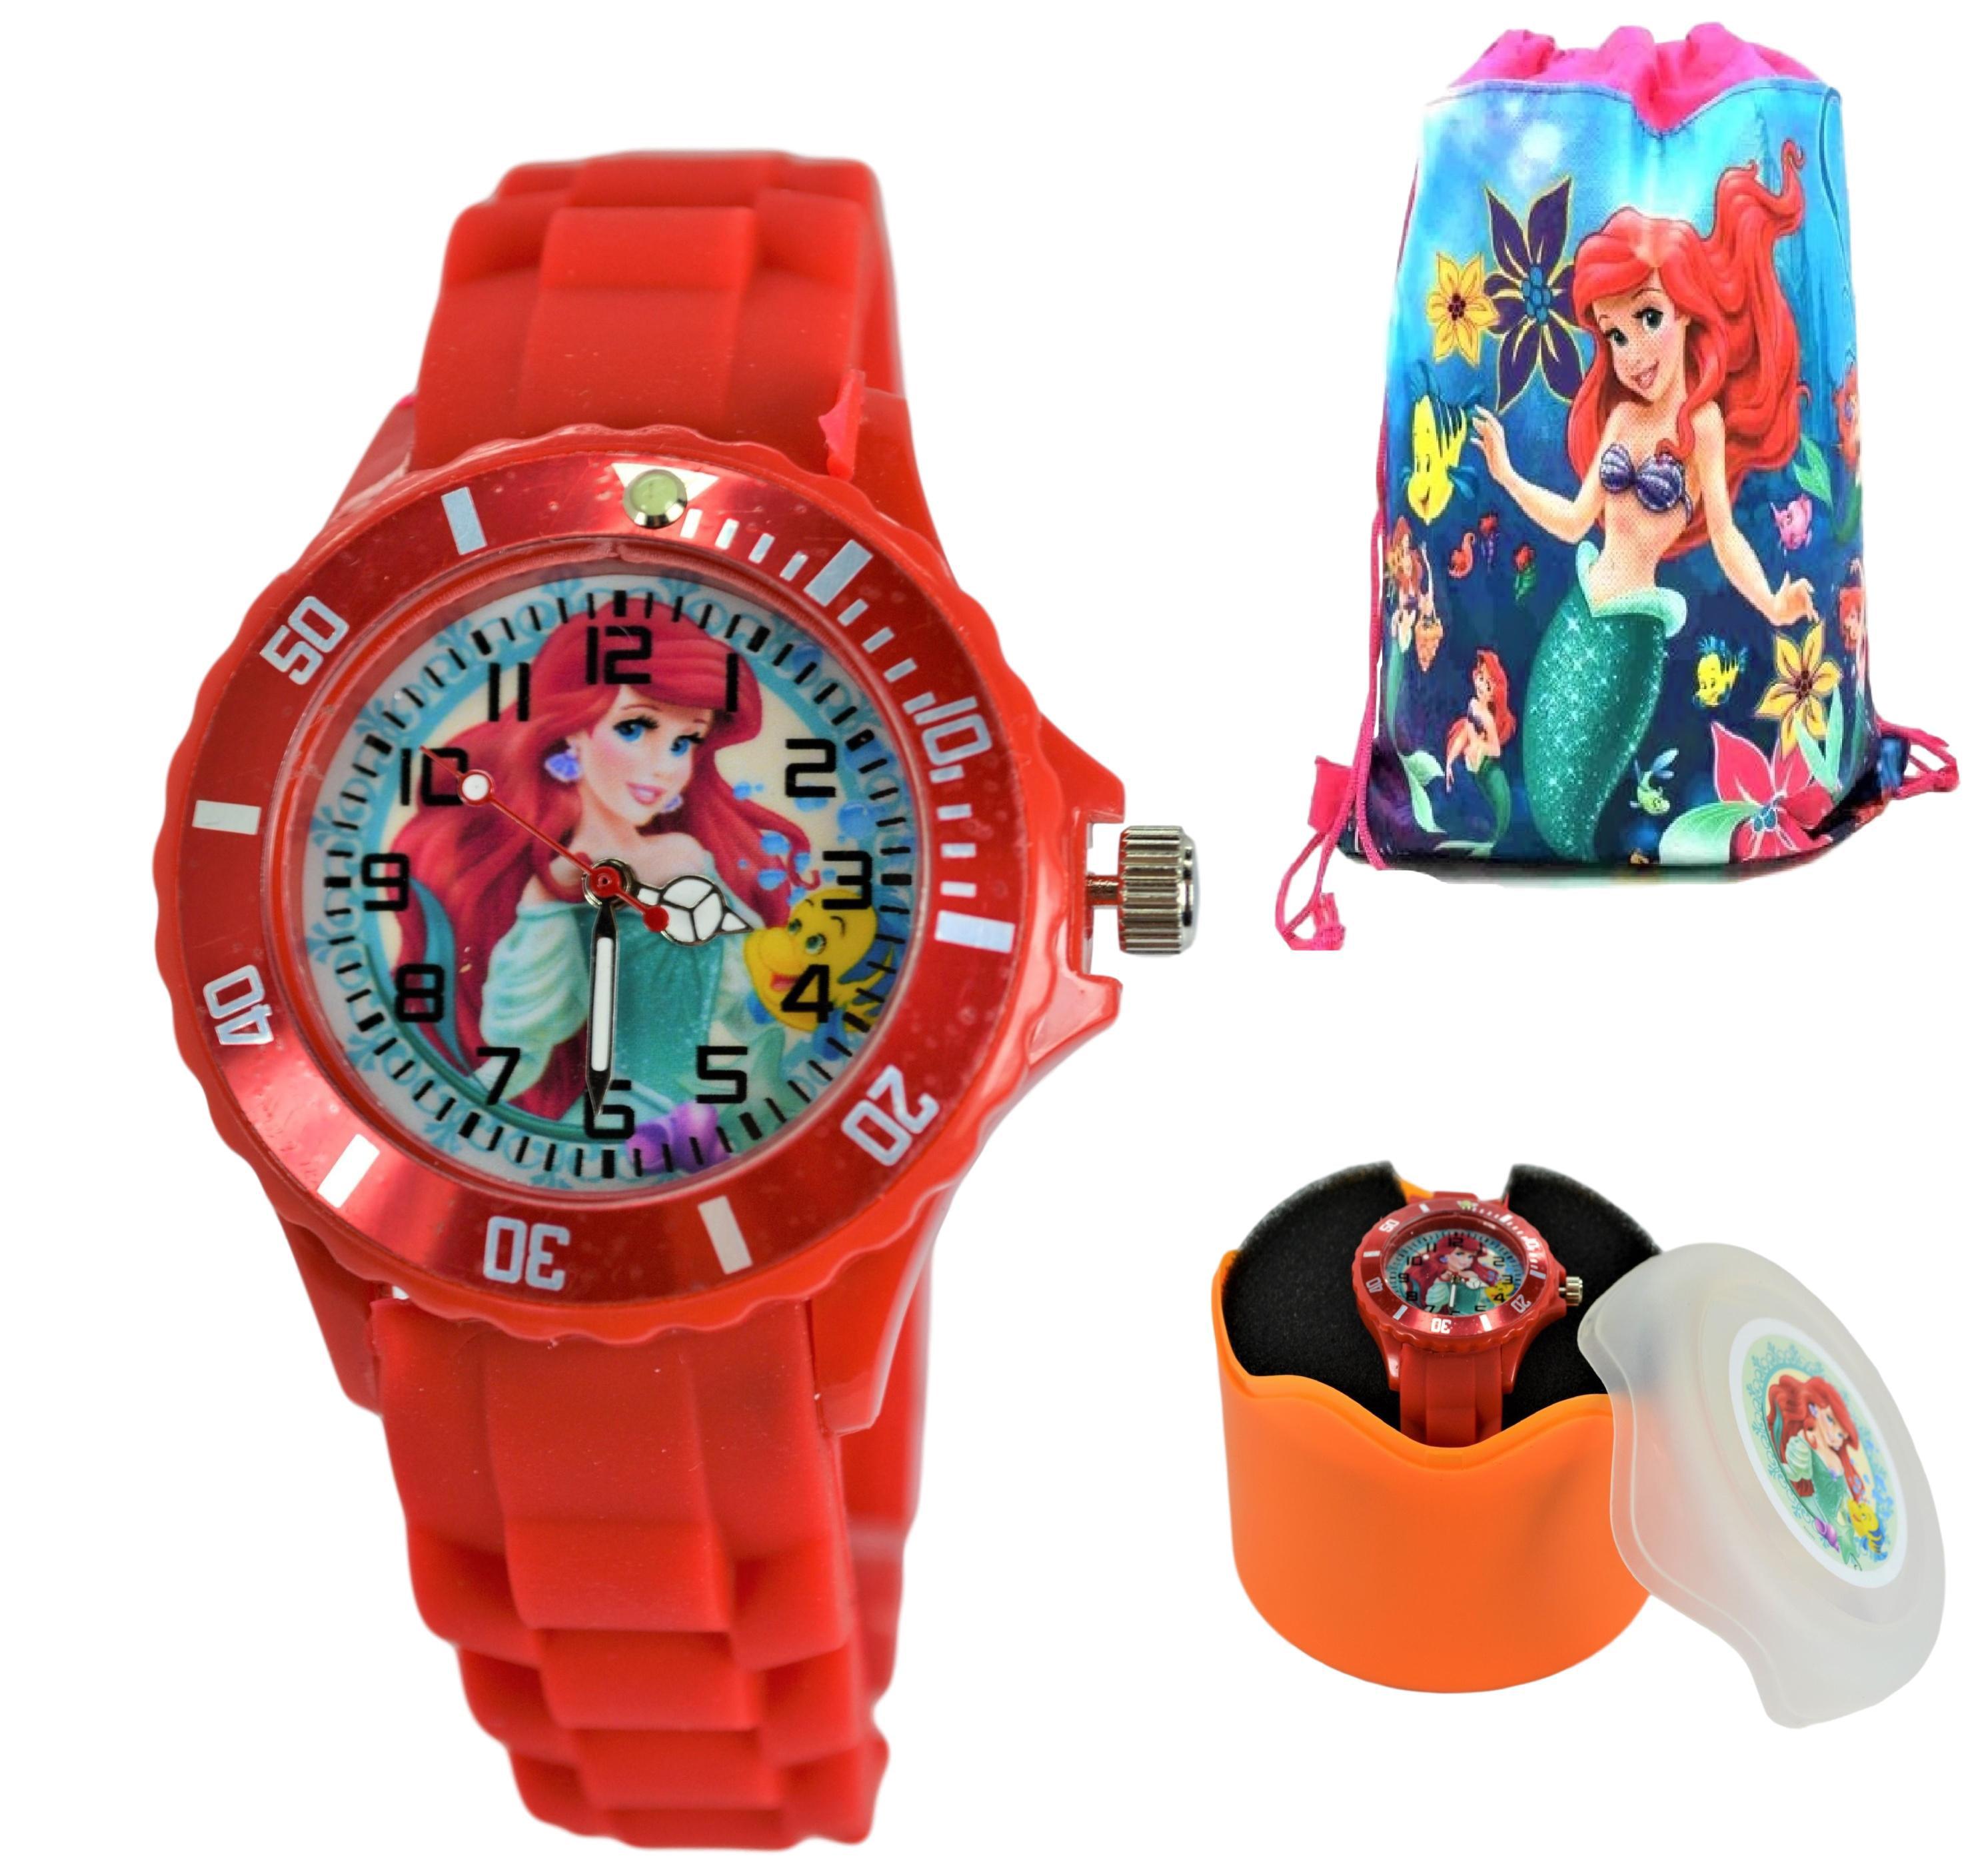 Disney Princess Little Mermaid Gift Set. Wrist Watch & Drawstring Bag For Girls